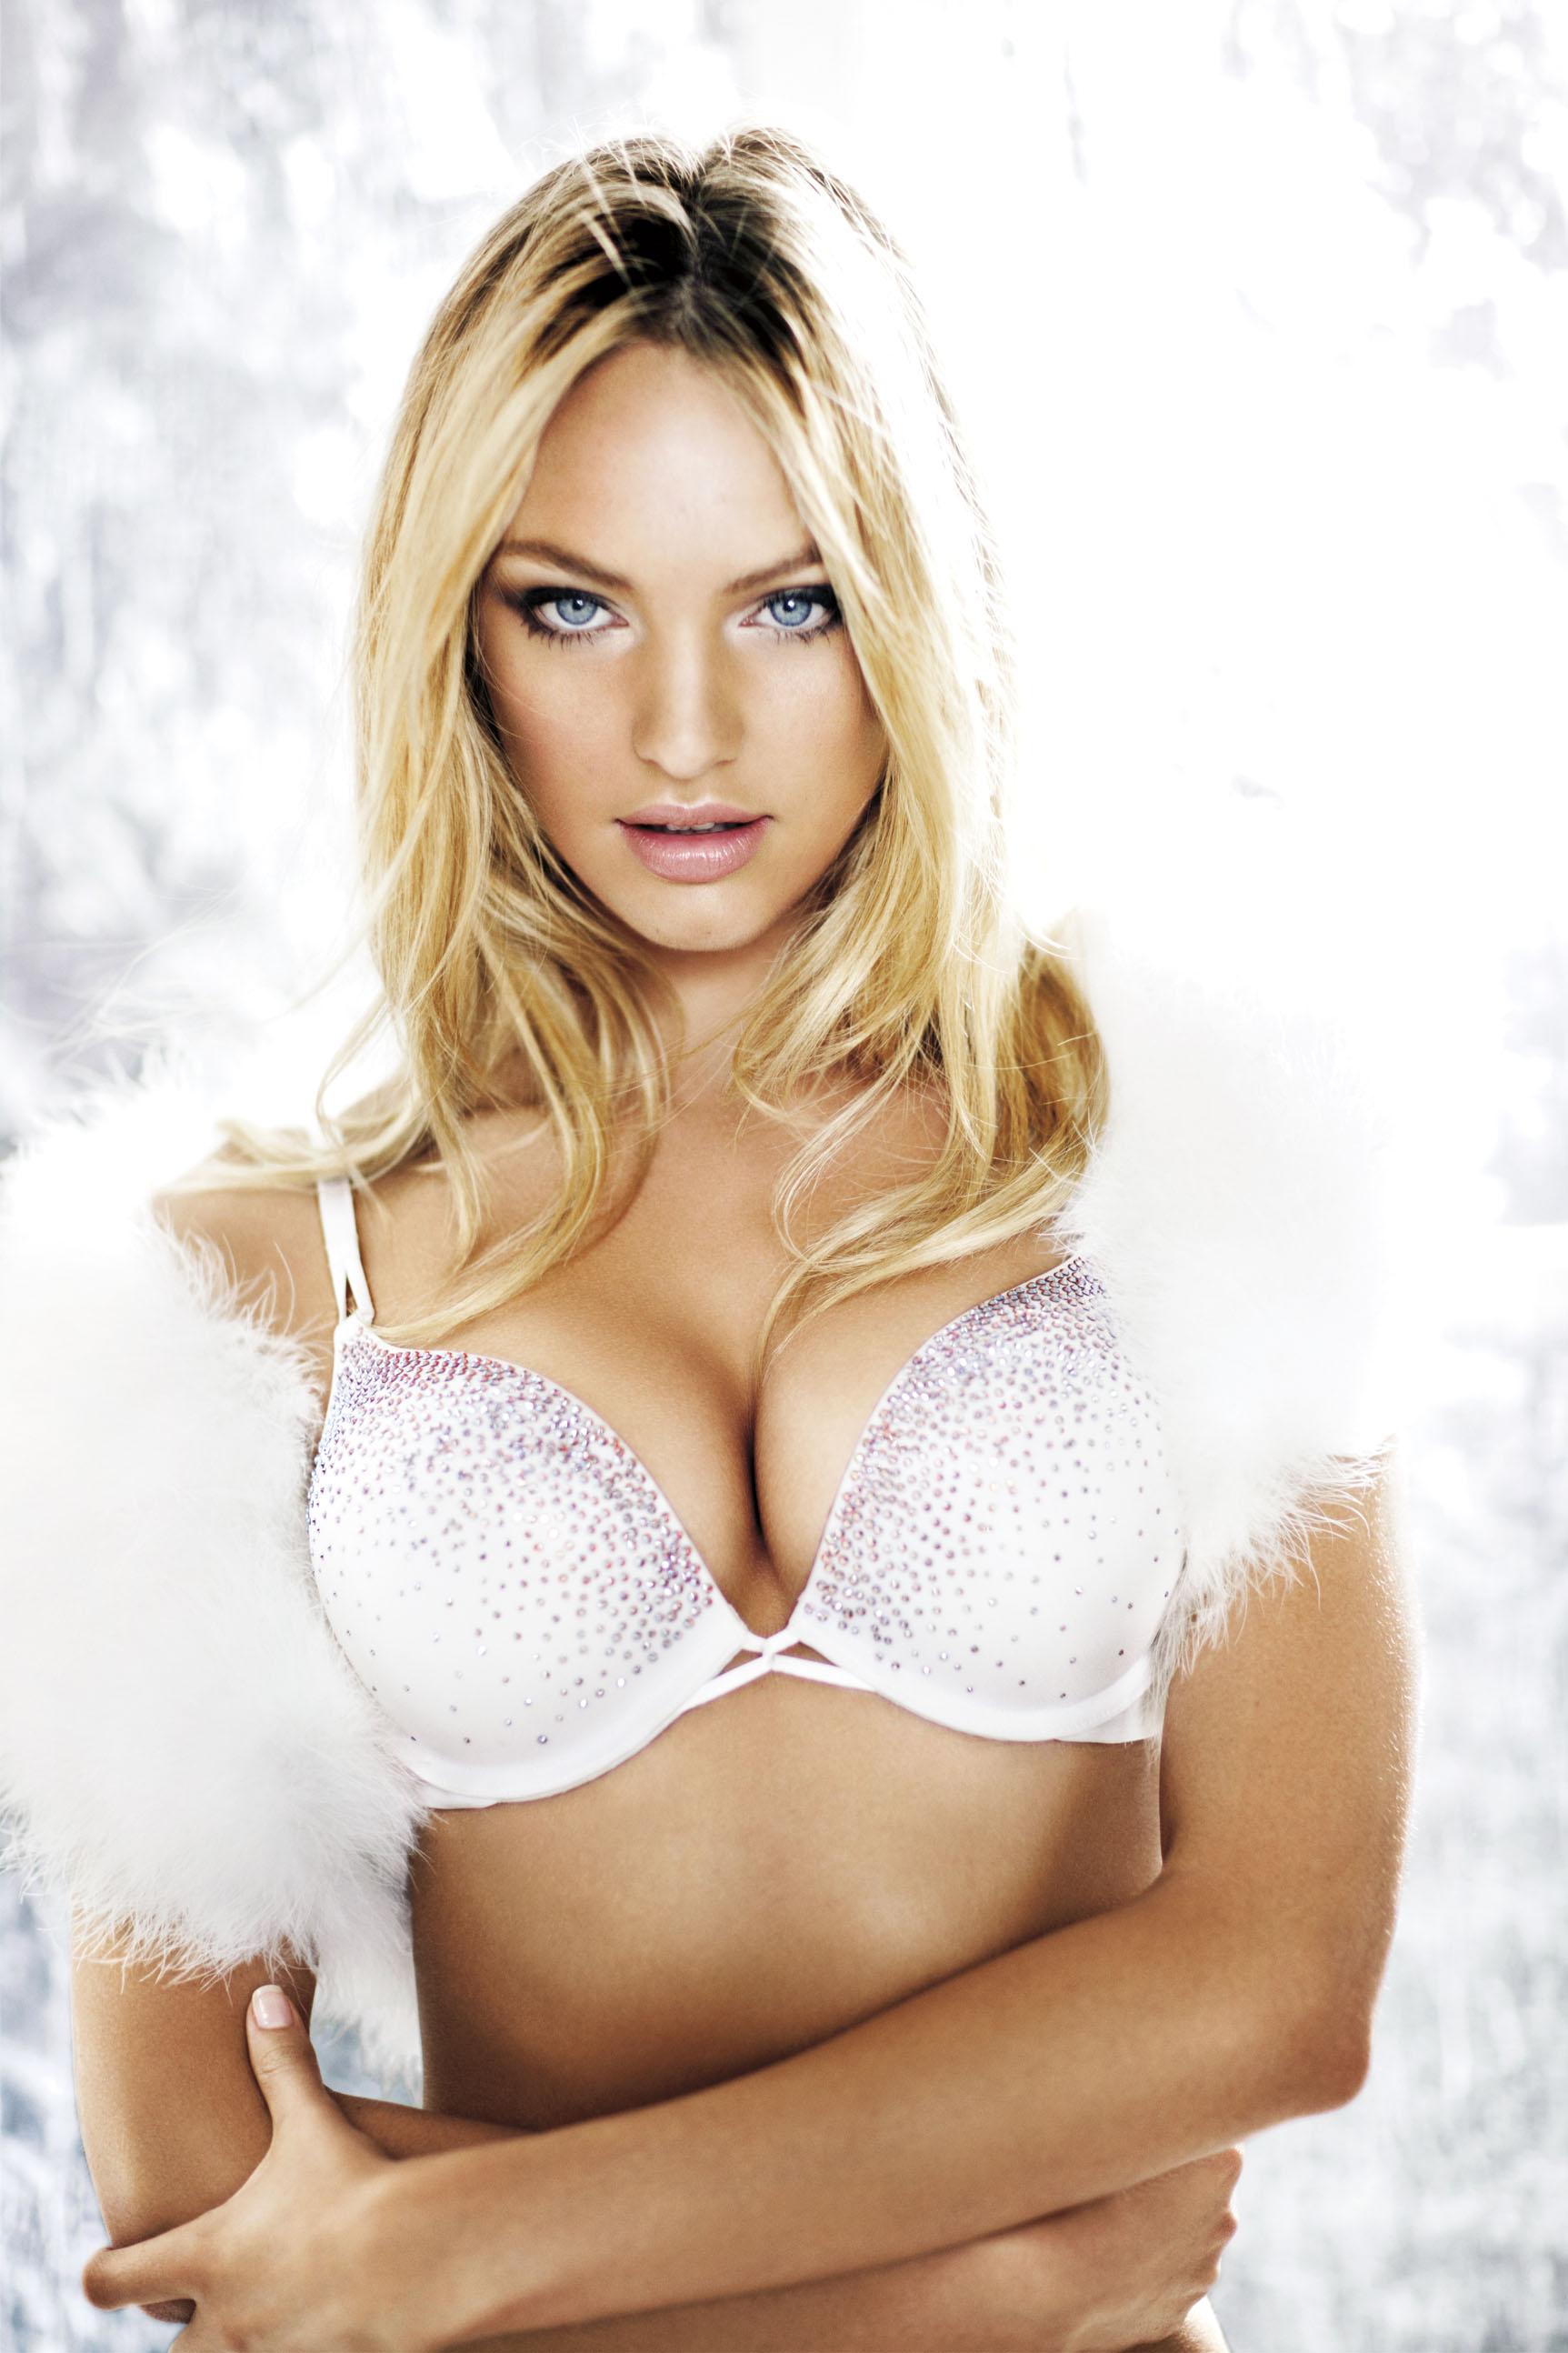 e82acf4b57 Holiday Miraculous-Push-Up-Bra Victorias-Secret